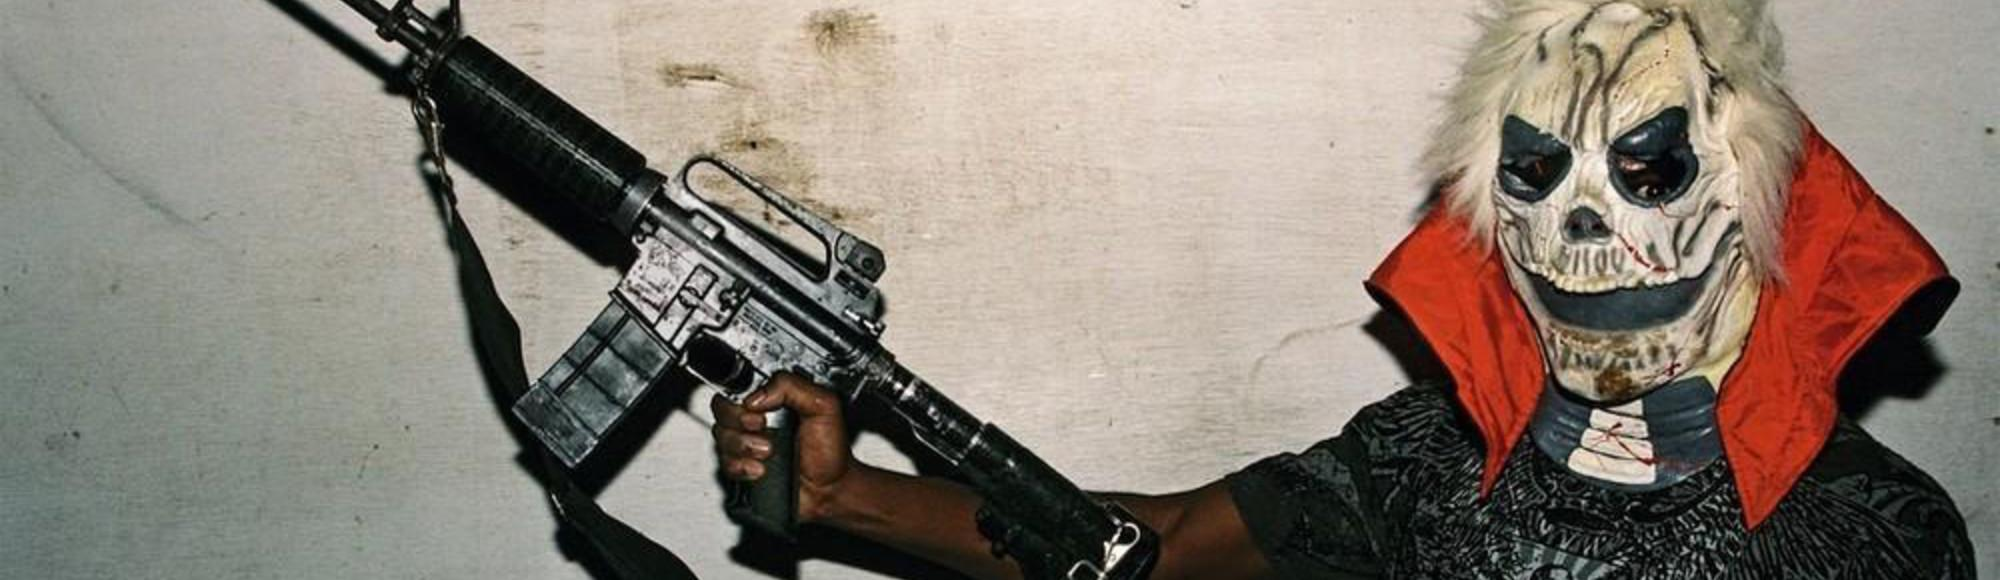 Inside Jamaica's Violent Slums